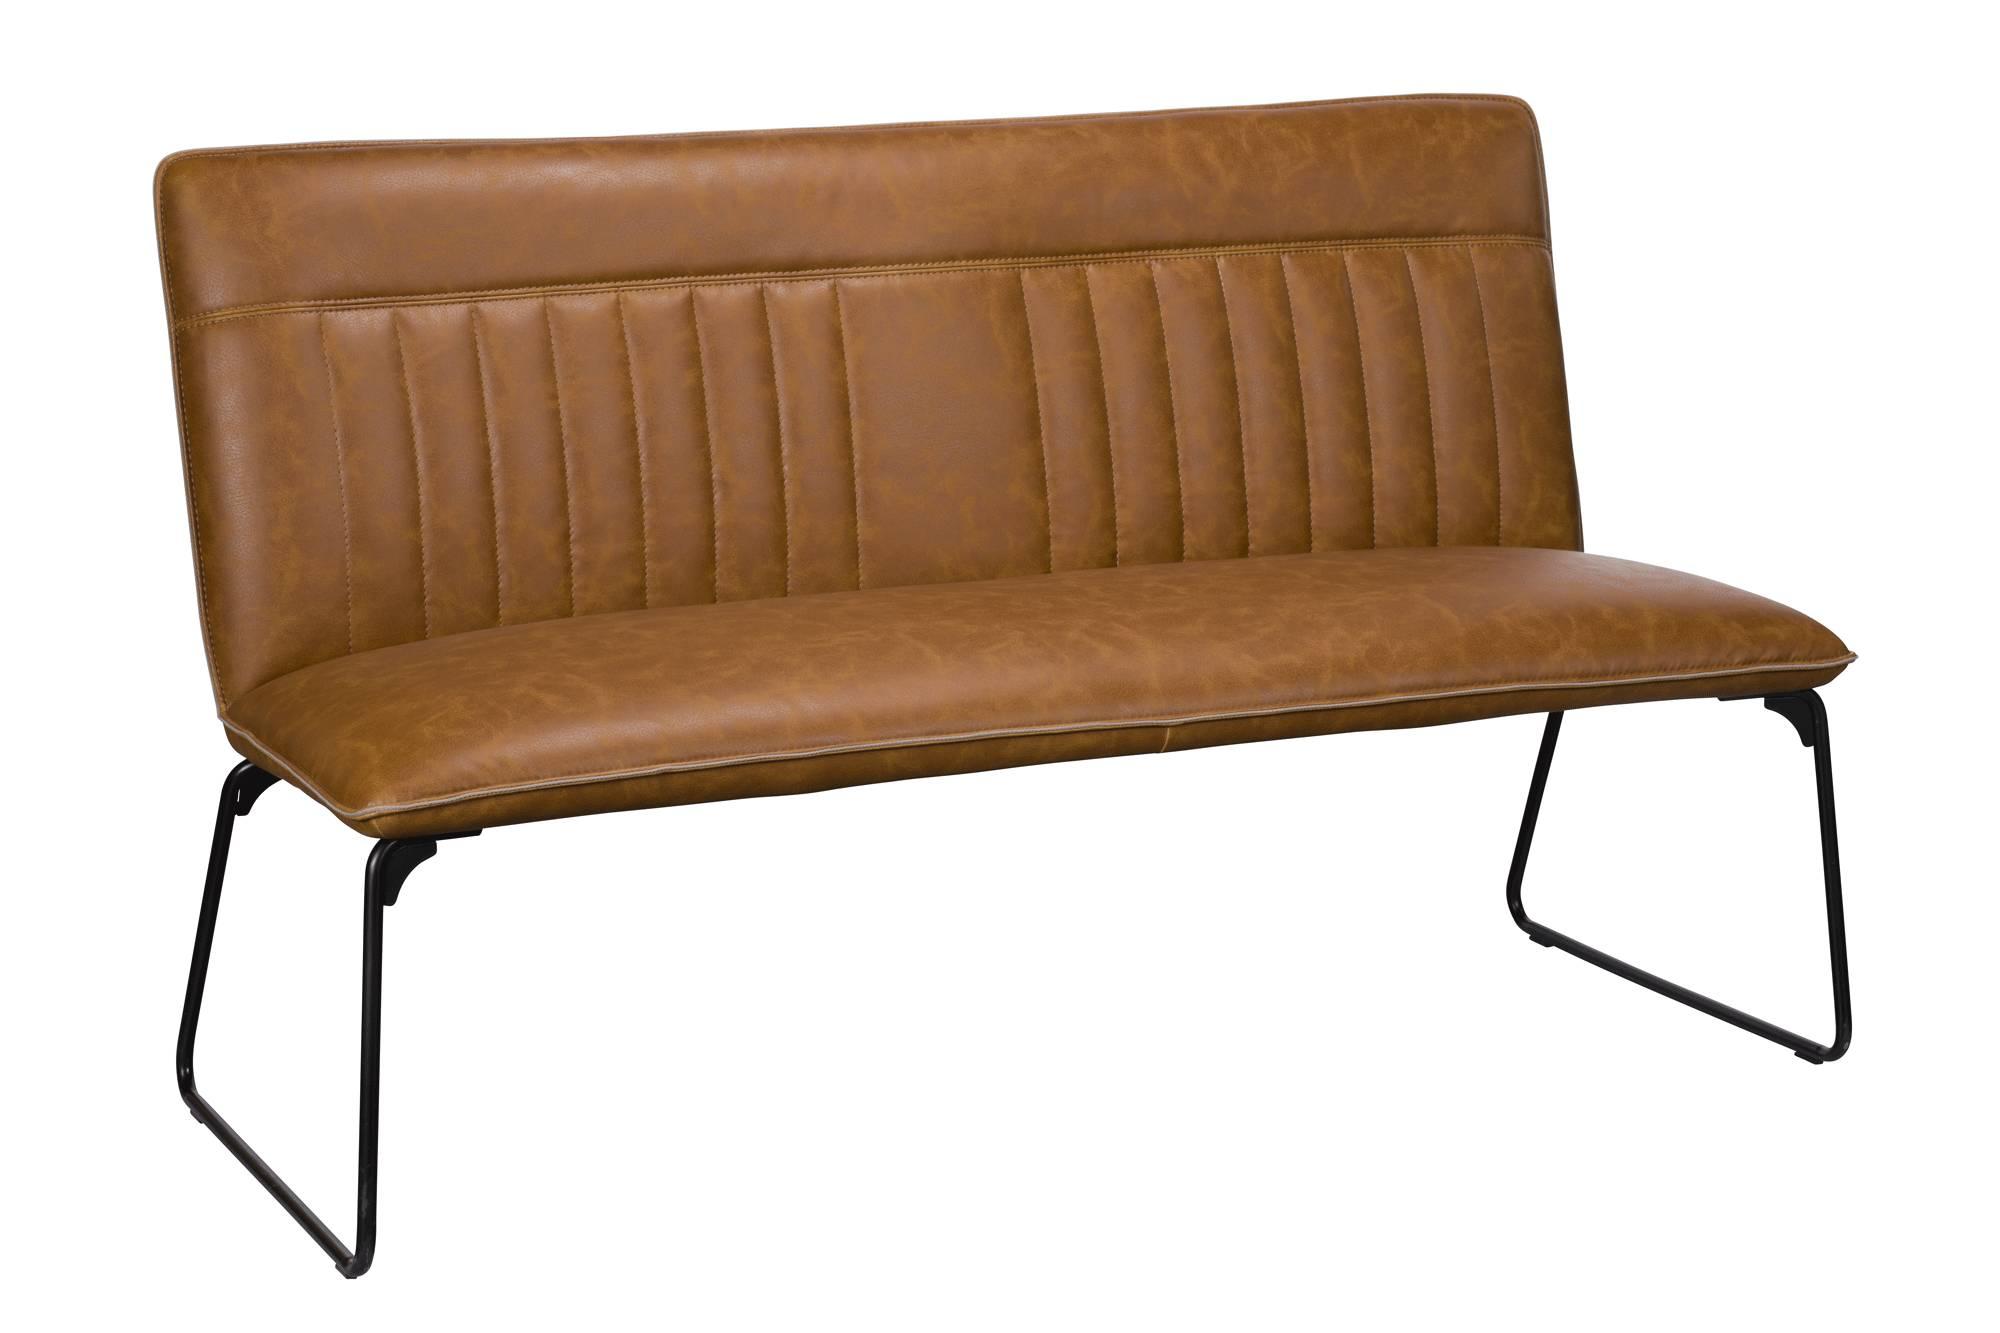 Astounding Soho Cooper C174 Dining Bench Tan Machost Co Dining Chair Design Ideas Machostcouk